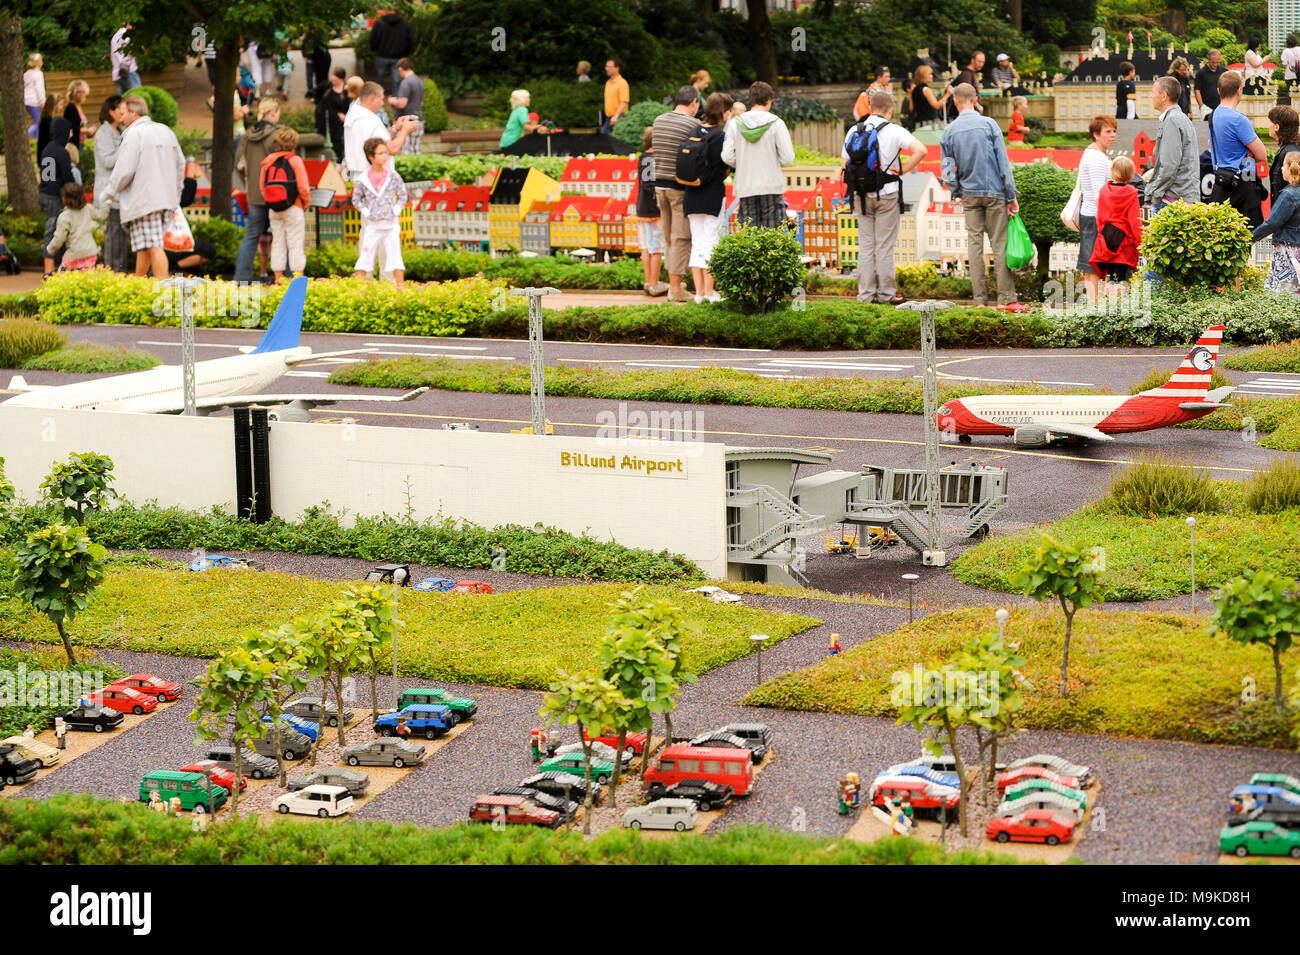 Mini Lego Briques L'aéroport Des En De BillundDanemark IED2H9W